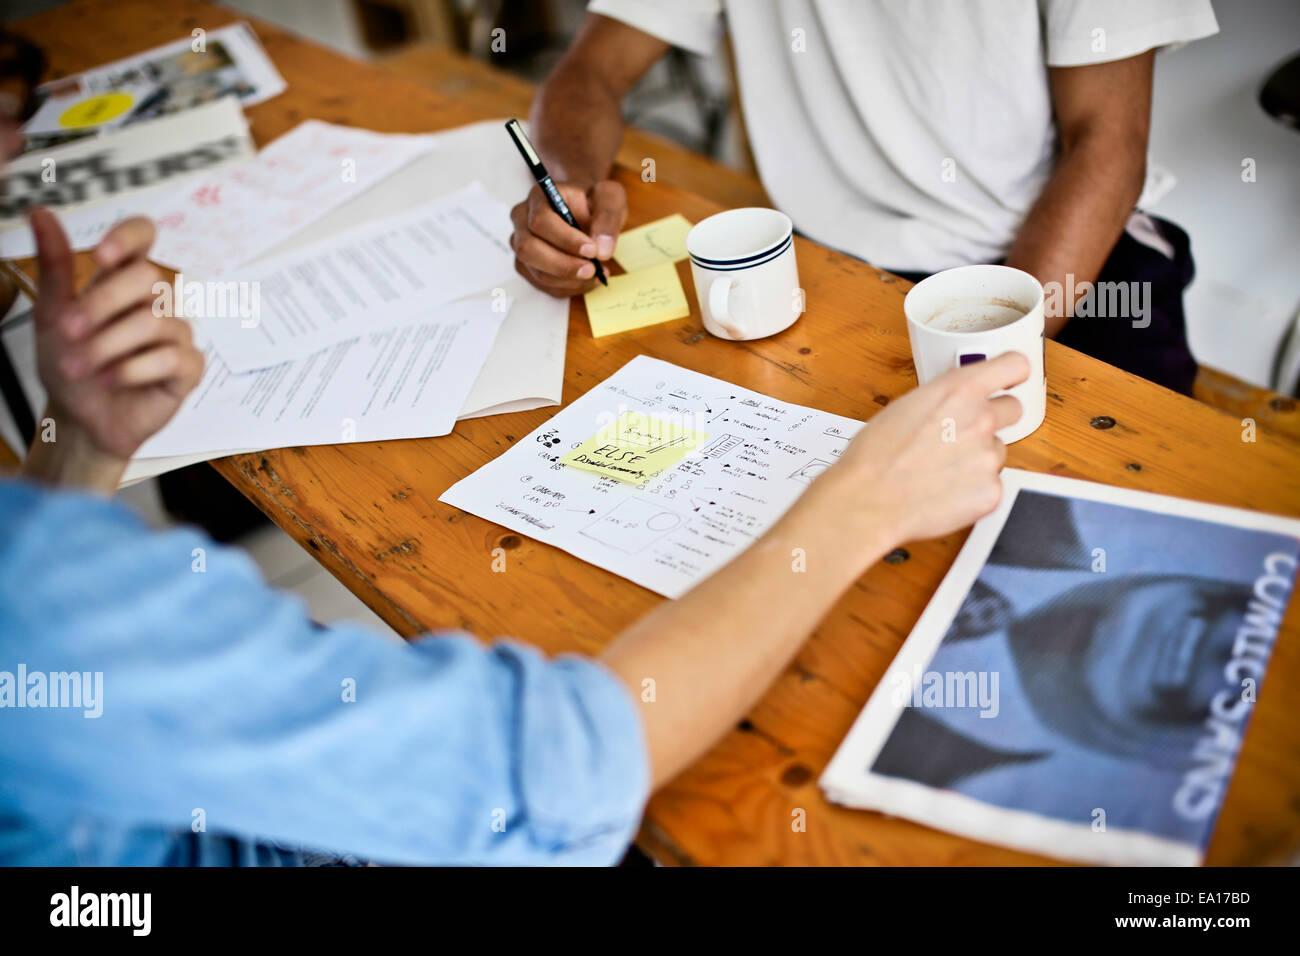 Graphic designers brainstorming - Stock Image